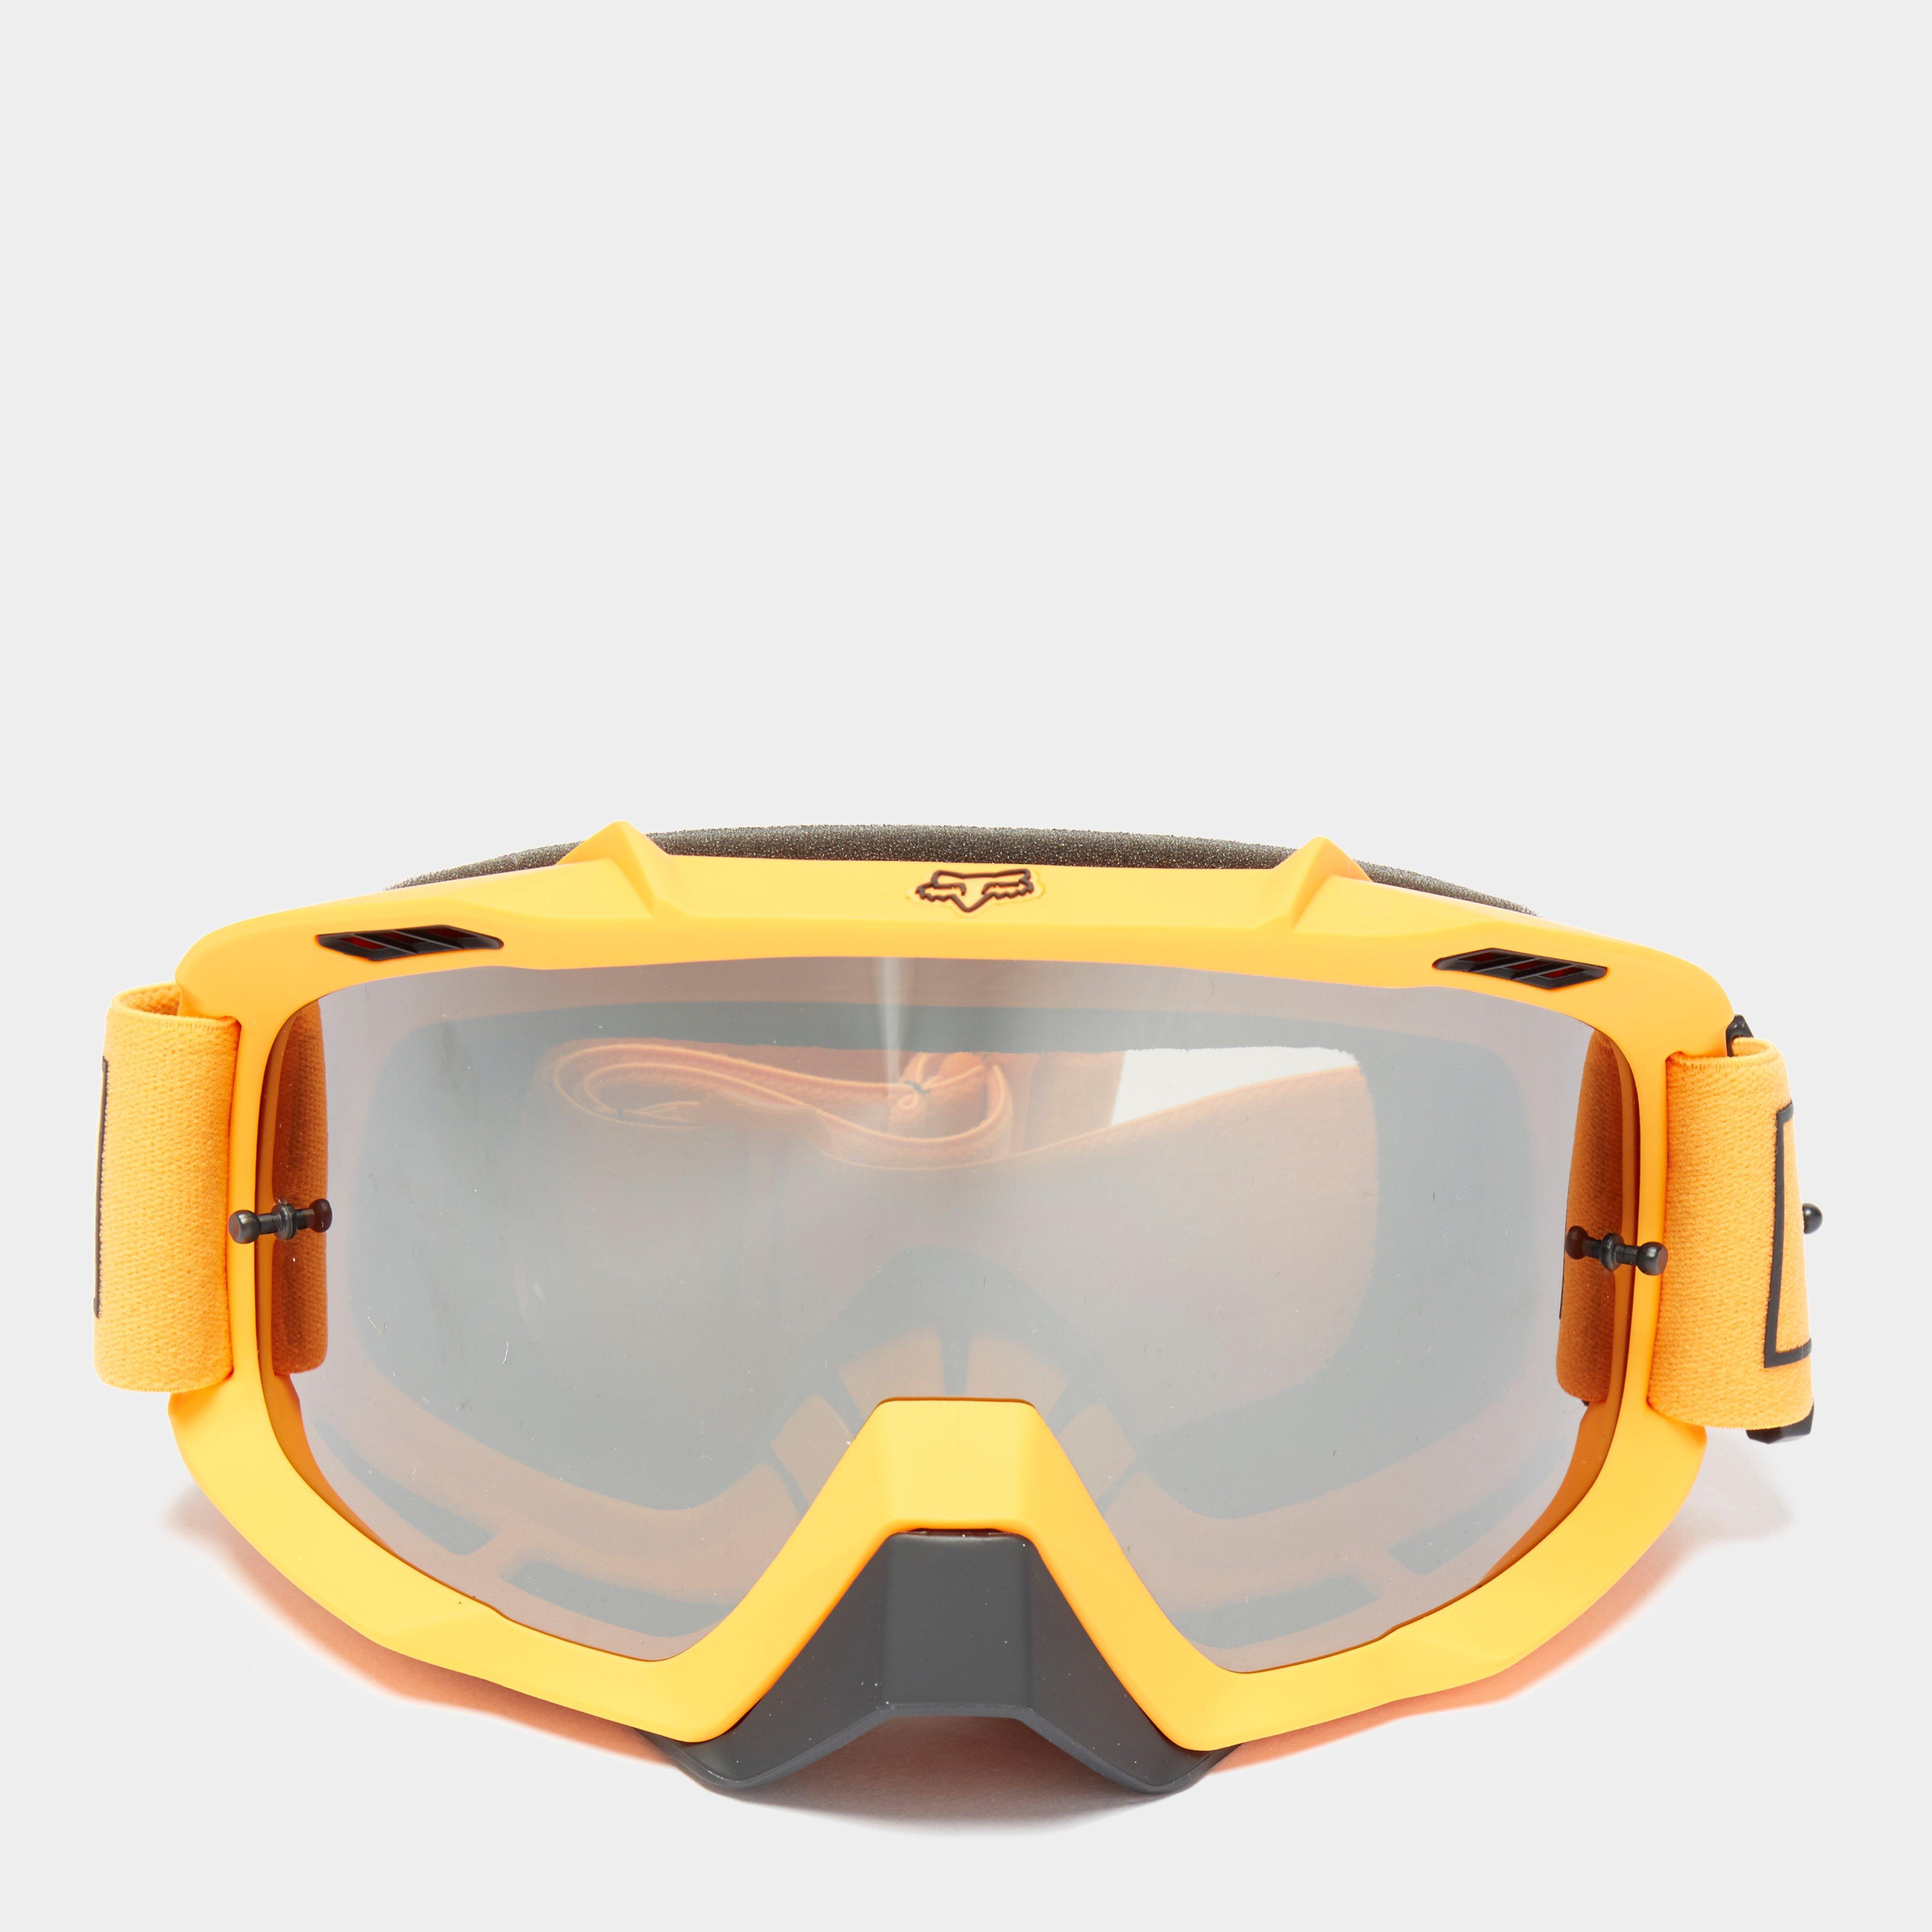 FOX Fox Air Space Gasoline Goggles - Orange, Orange